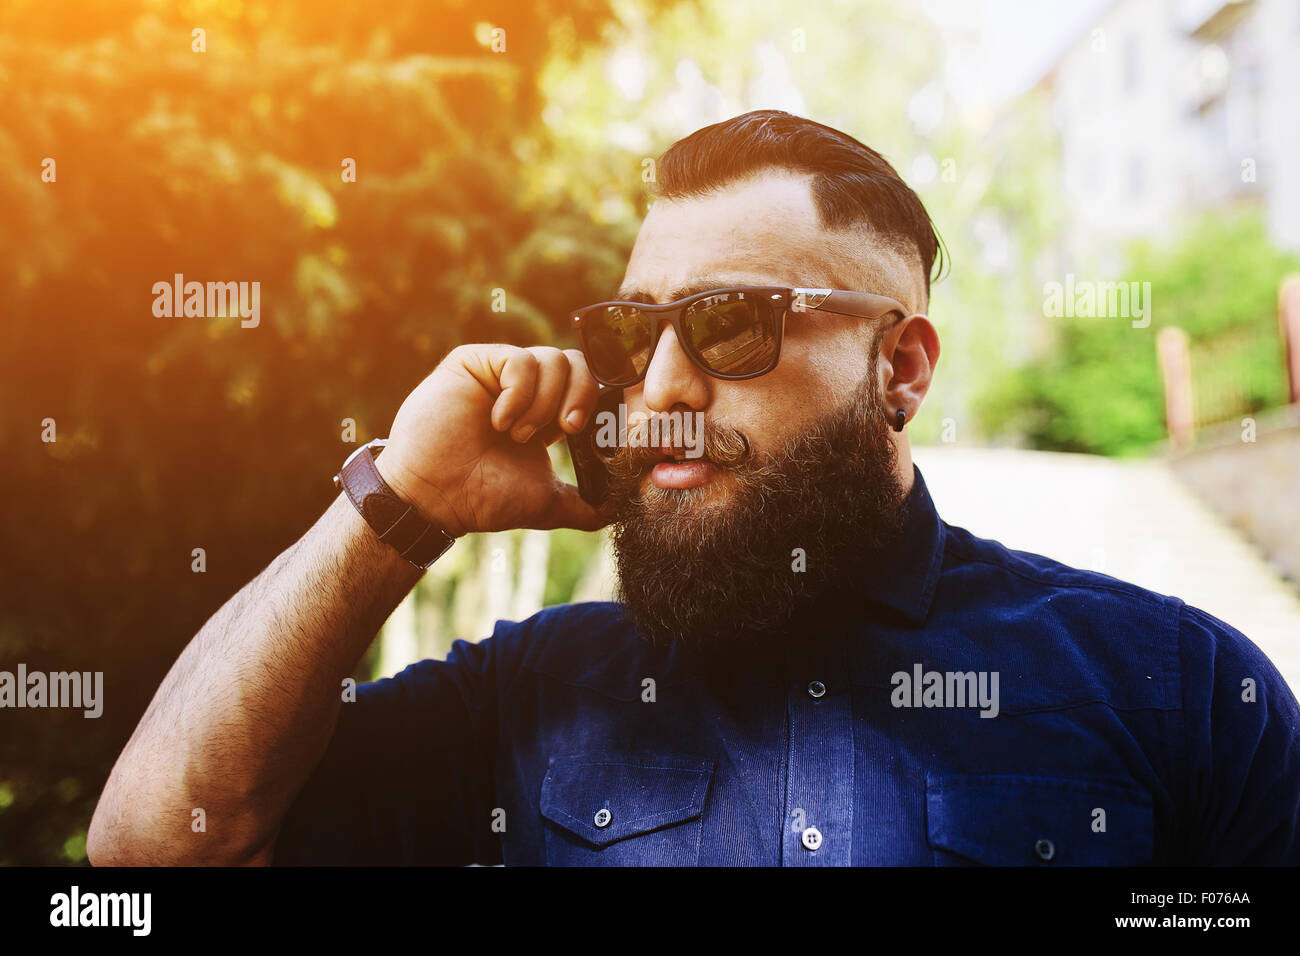 bearded speaks by phone - Stock Image